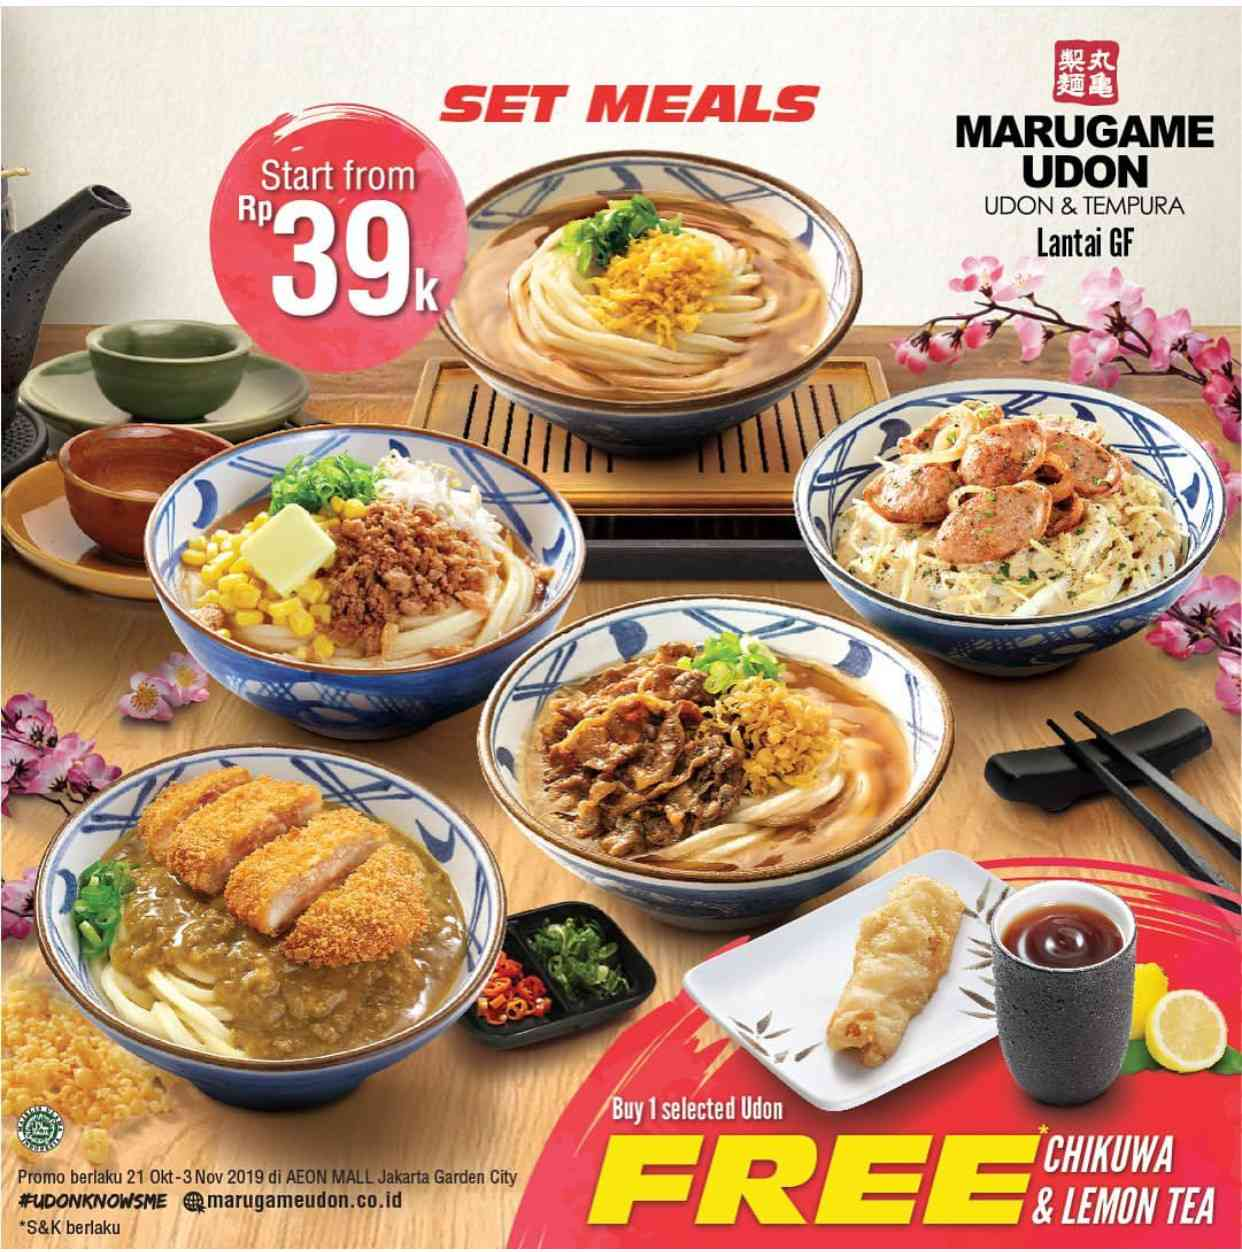 Marugame Udon Promo Set Meal mulai Rp. 39.000 saja